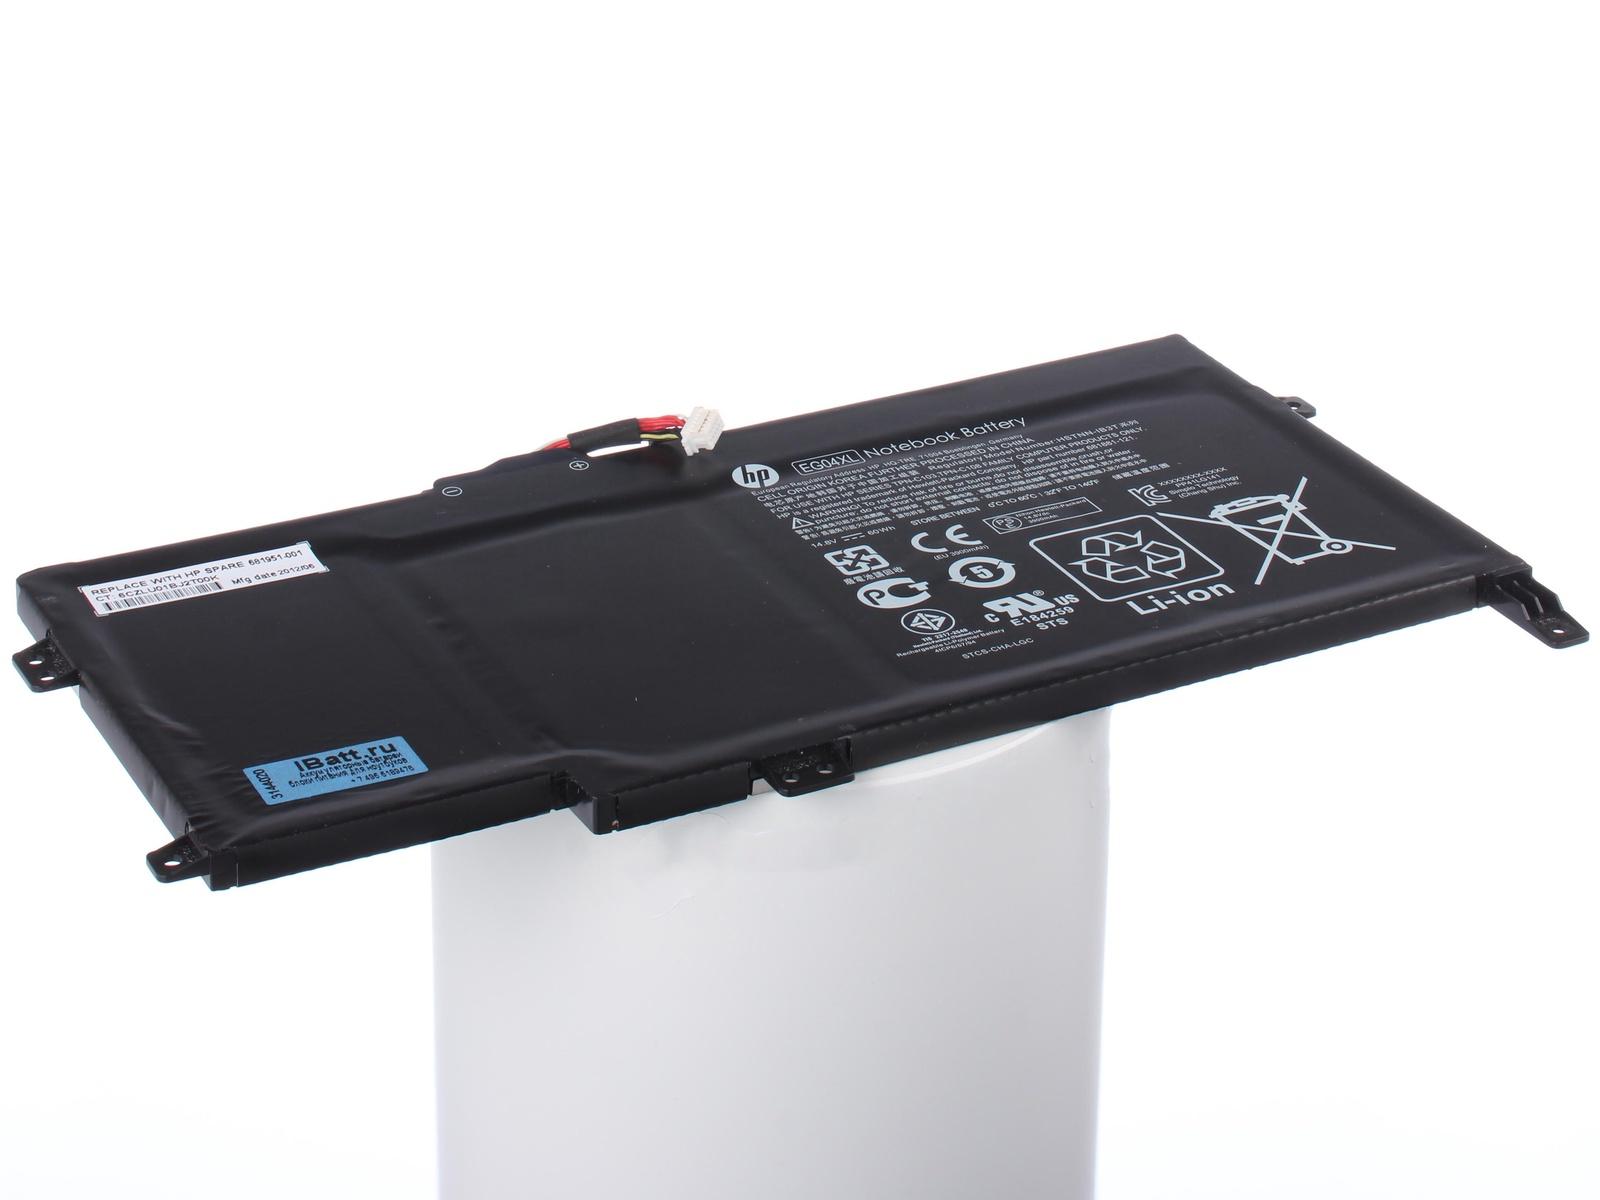 Аккумулятор для ноутбука iBatt HP-Compaq EG04XL, EG04, 681881-171 компьютер compaq